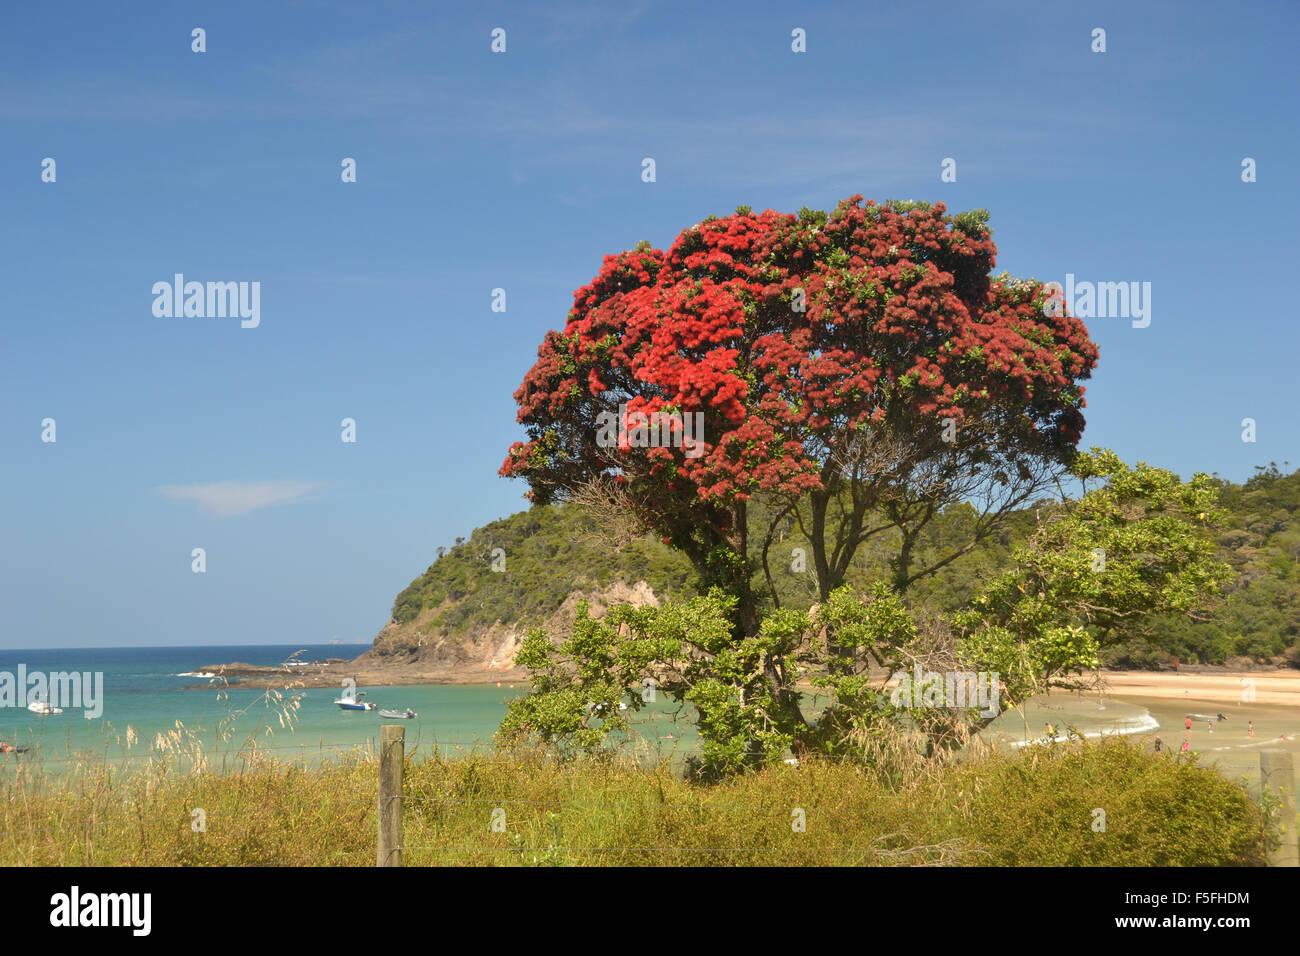 New Zealand Christmas tree or Pohutukawa, Metrosideros excelsa, Matapouri Beach, North Island, New Zealand - Stock Image